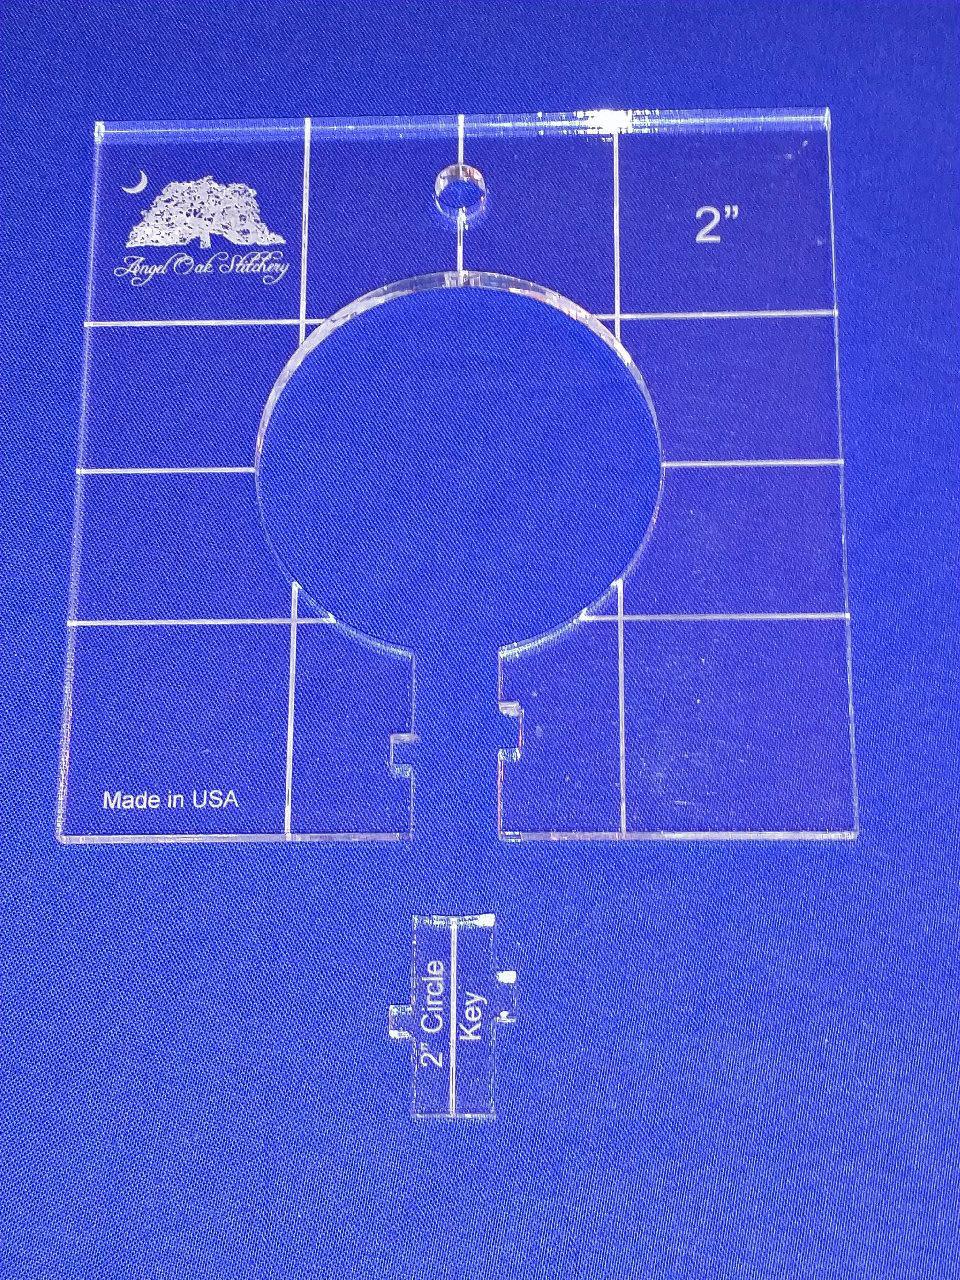 2 inch Circle Rulerwork Quilting Template